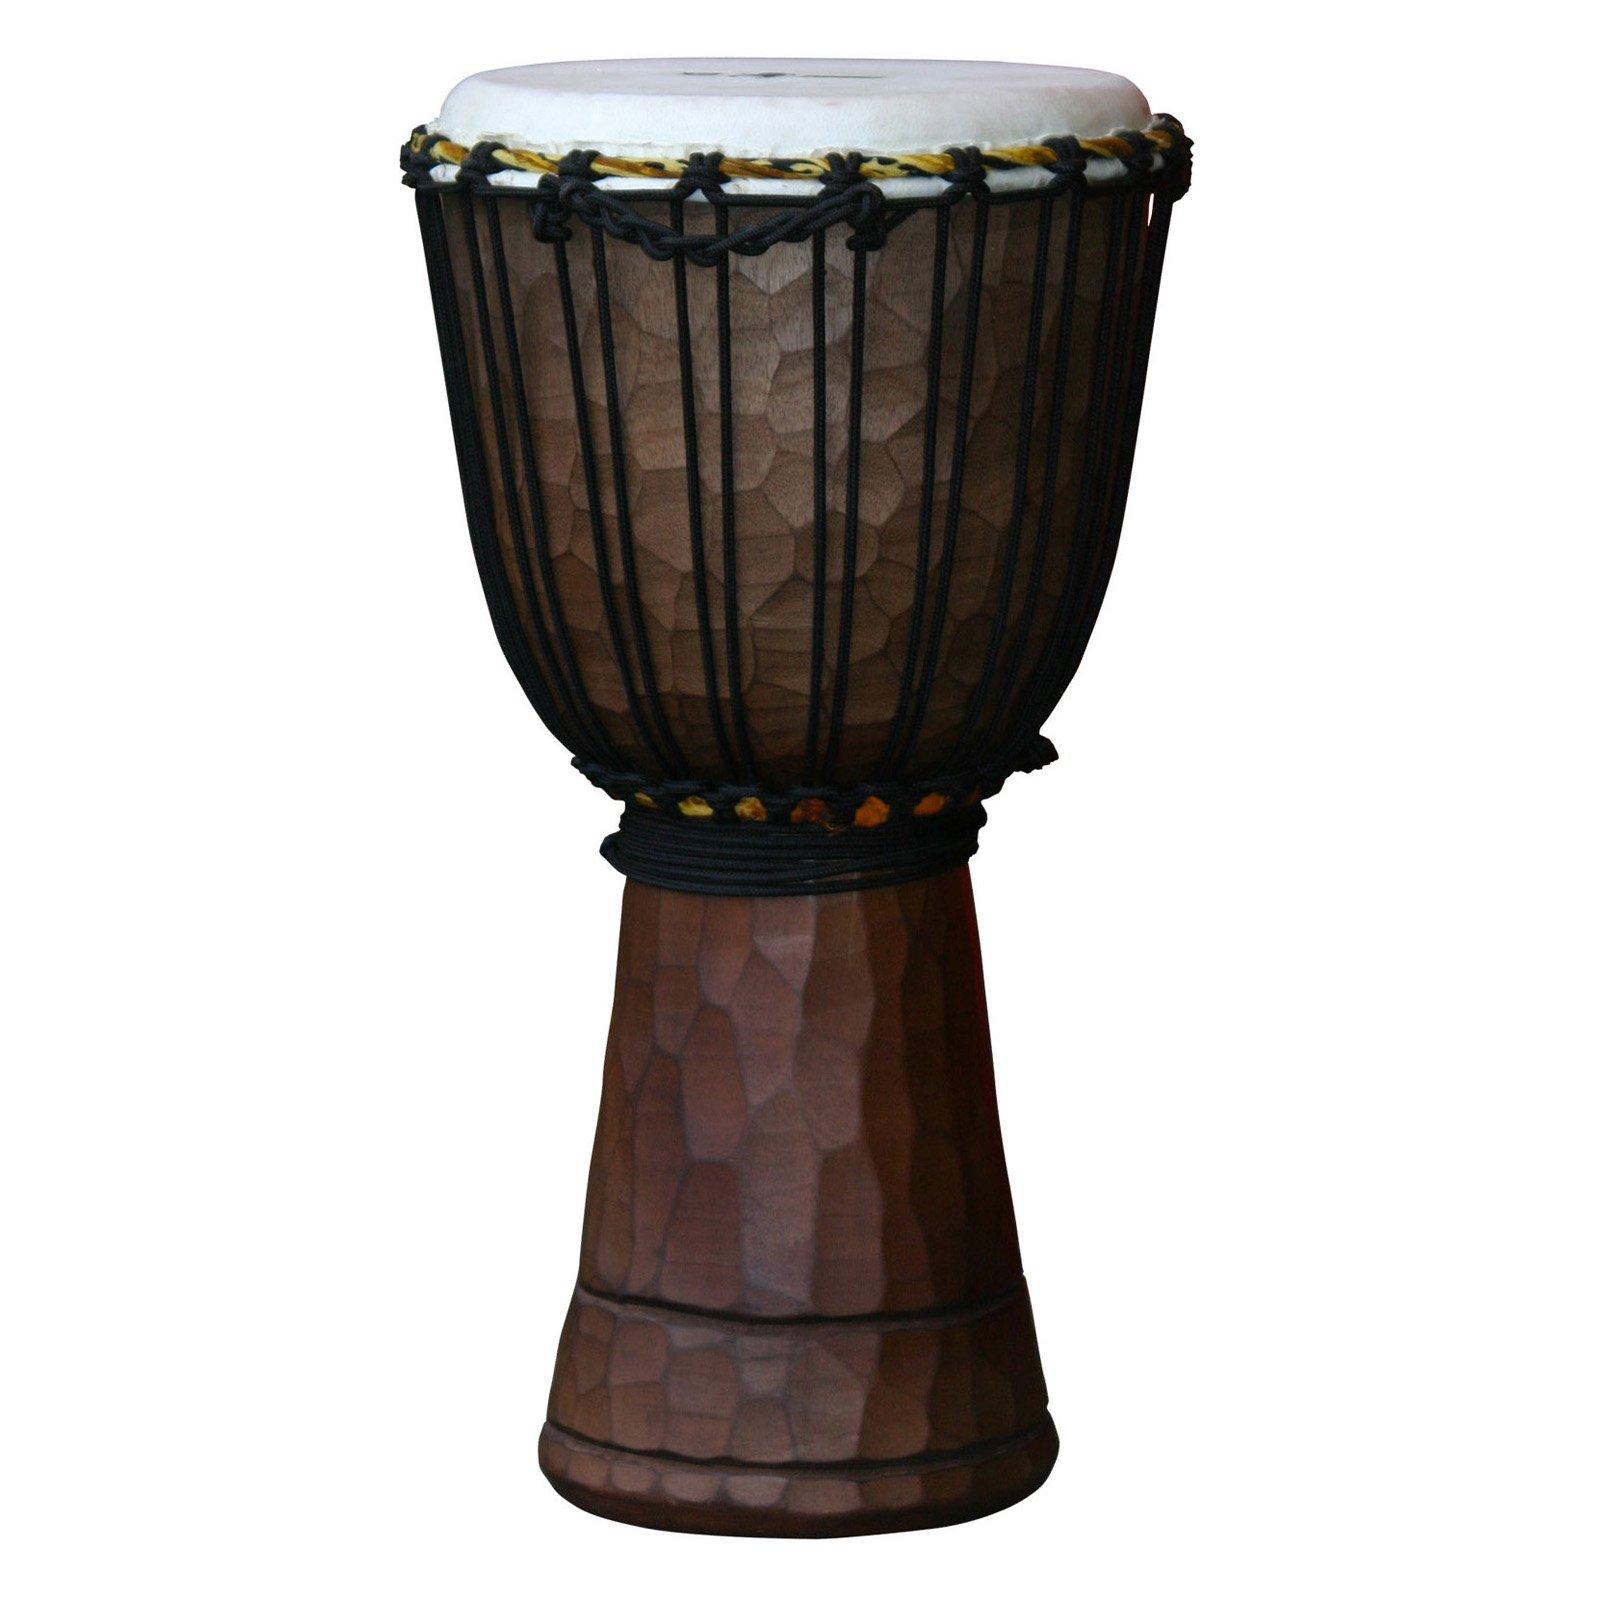 X8 Drums Jammer African Djembe Drum